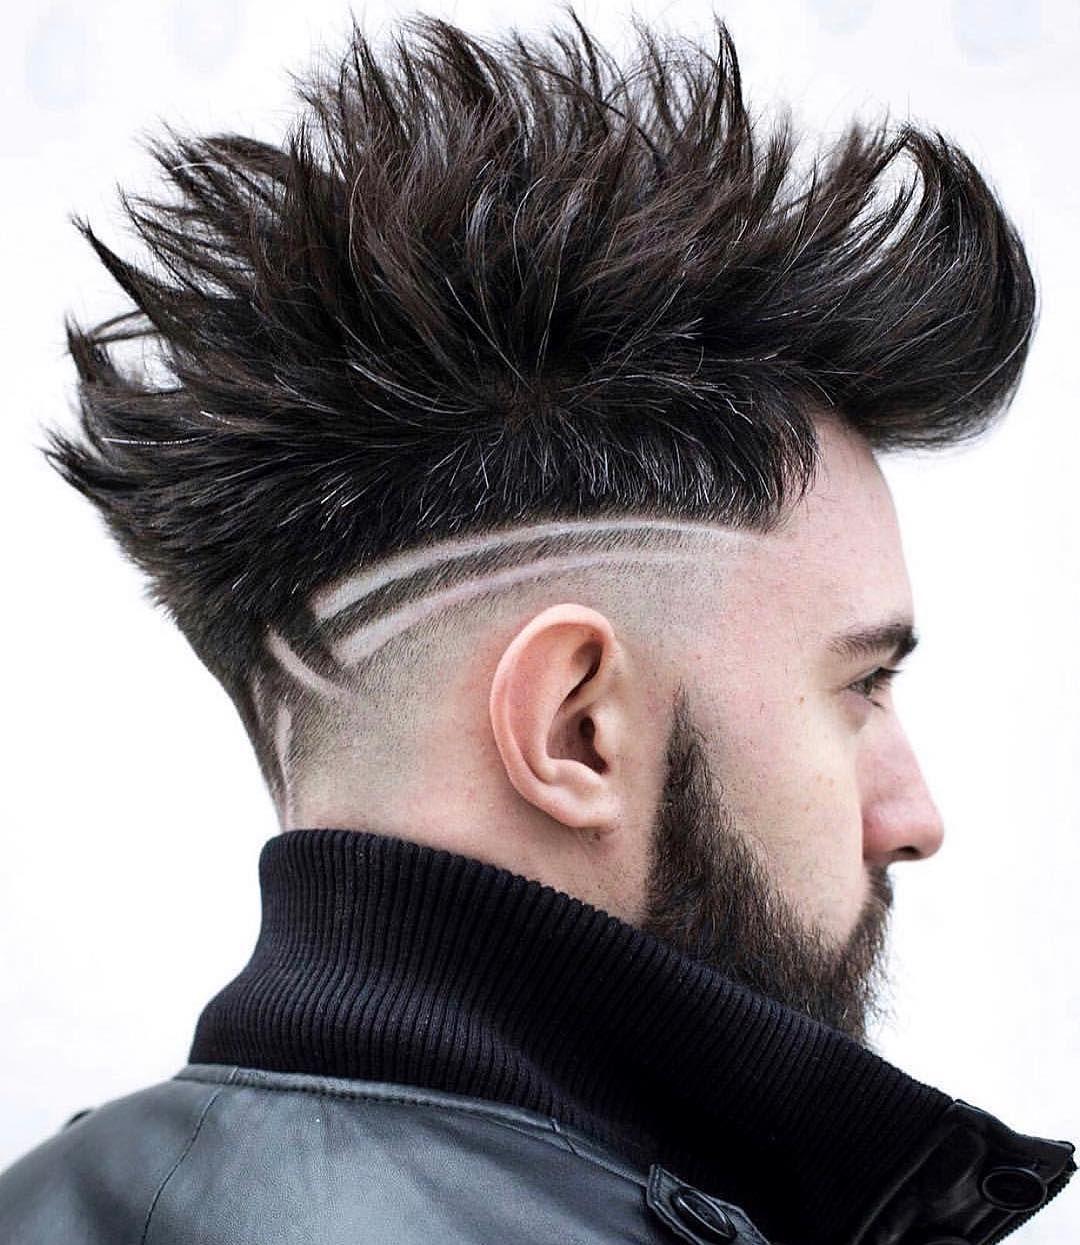 Sharpfade Barbergame Showcasebarbers Lowfade Barberlove